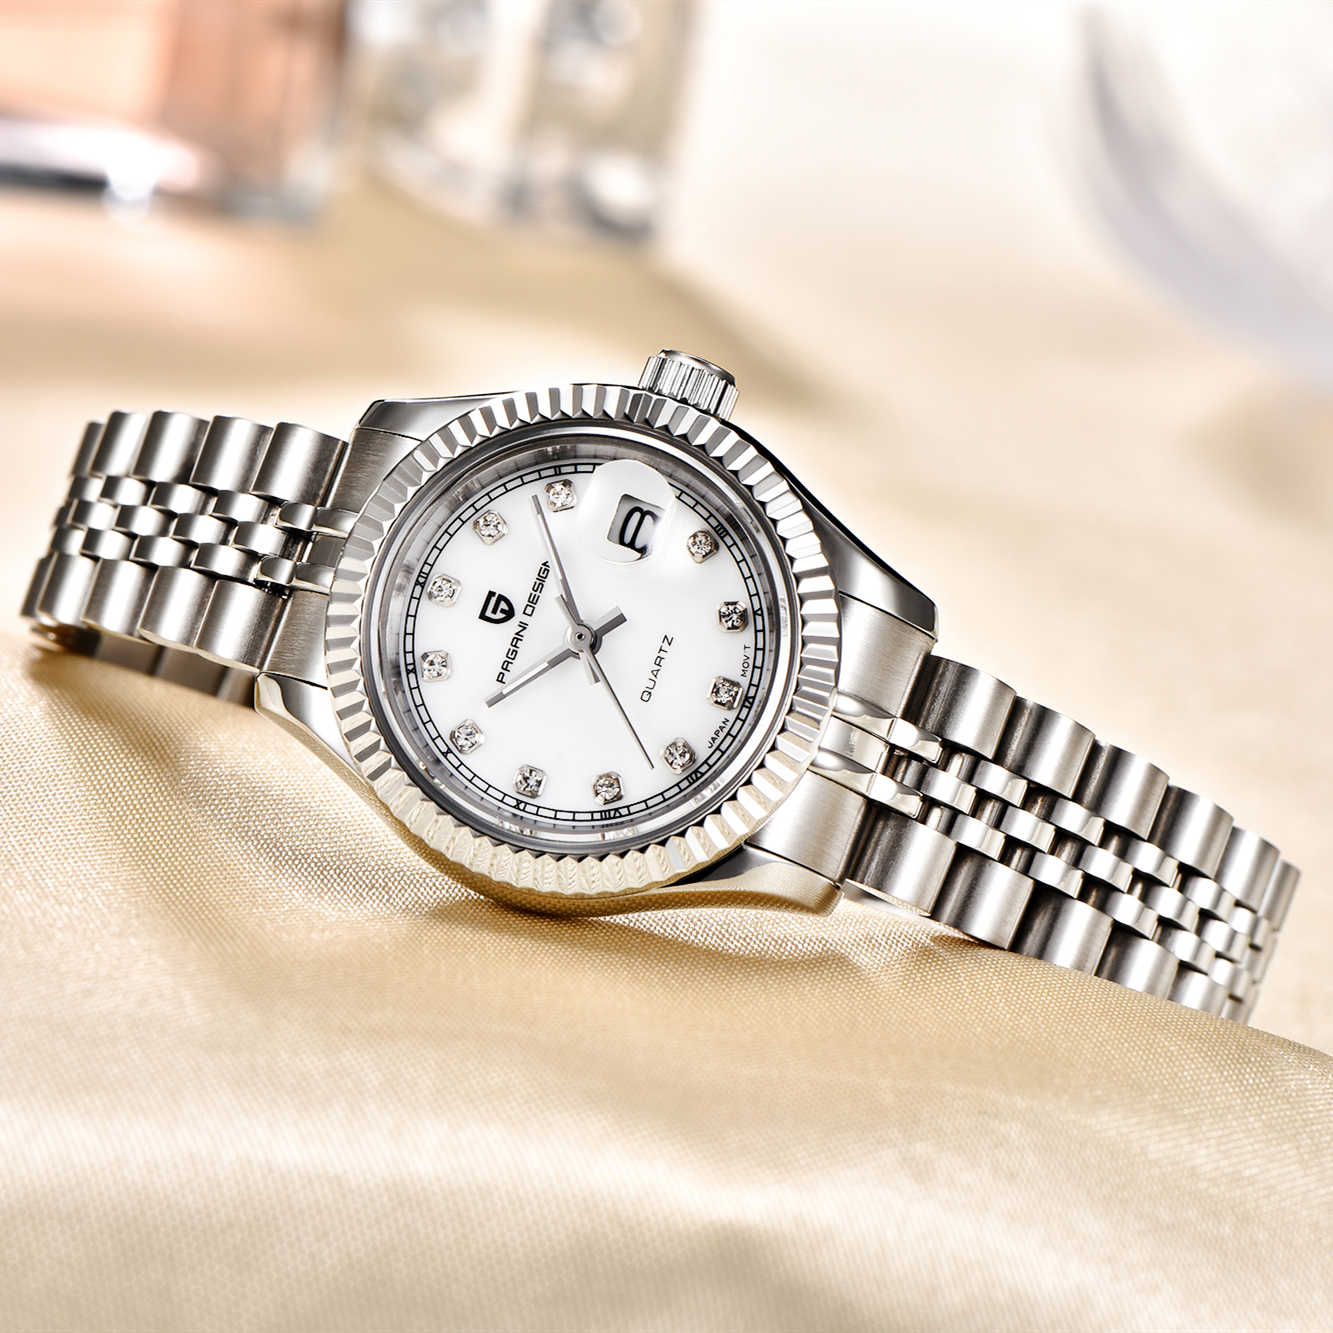 PAGANI עיצוב למעלה יוקרה מותג נשים שעונים גבירותיי שעון יד נירוסטה קלאסי ילדה נקבה שעון Relogio Feminino